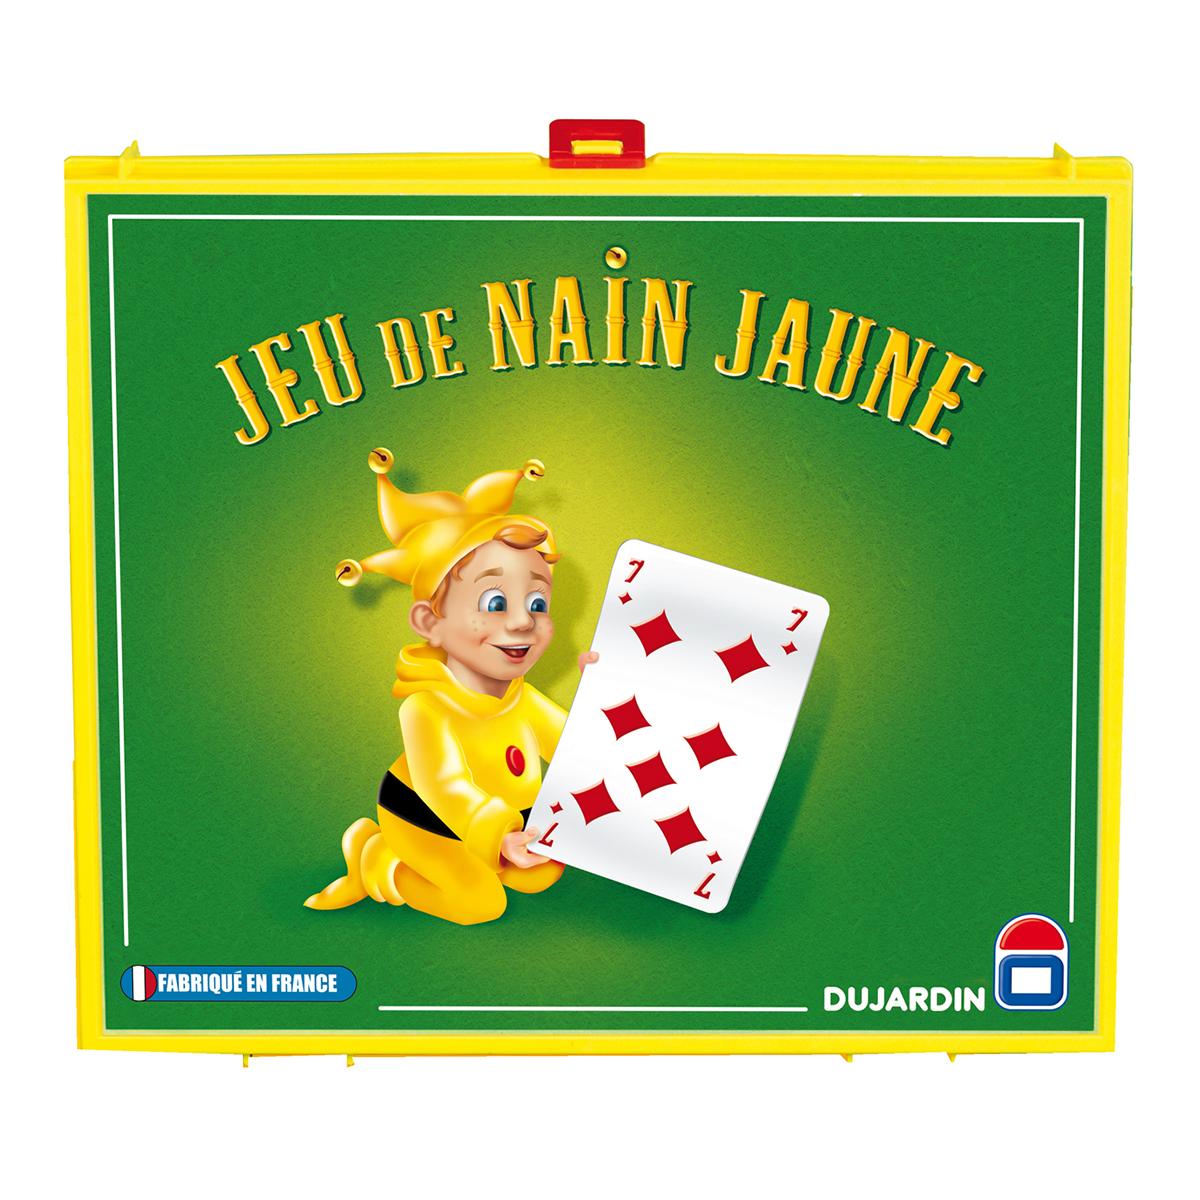 Nain jaune et cartes